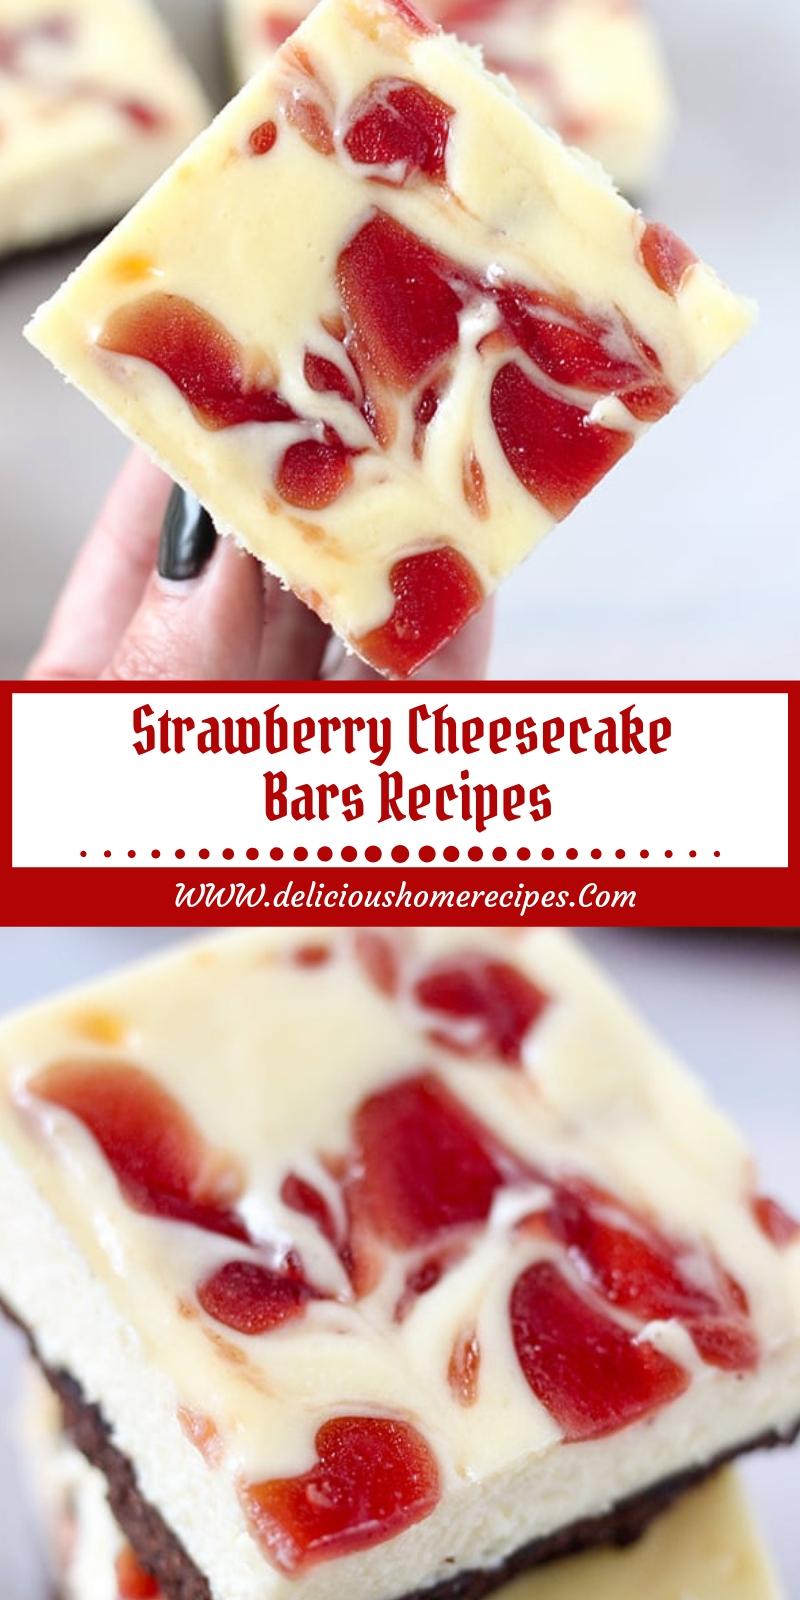 Strawberry Cheesecake Bars Recipes